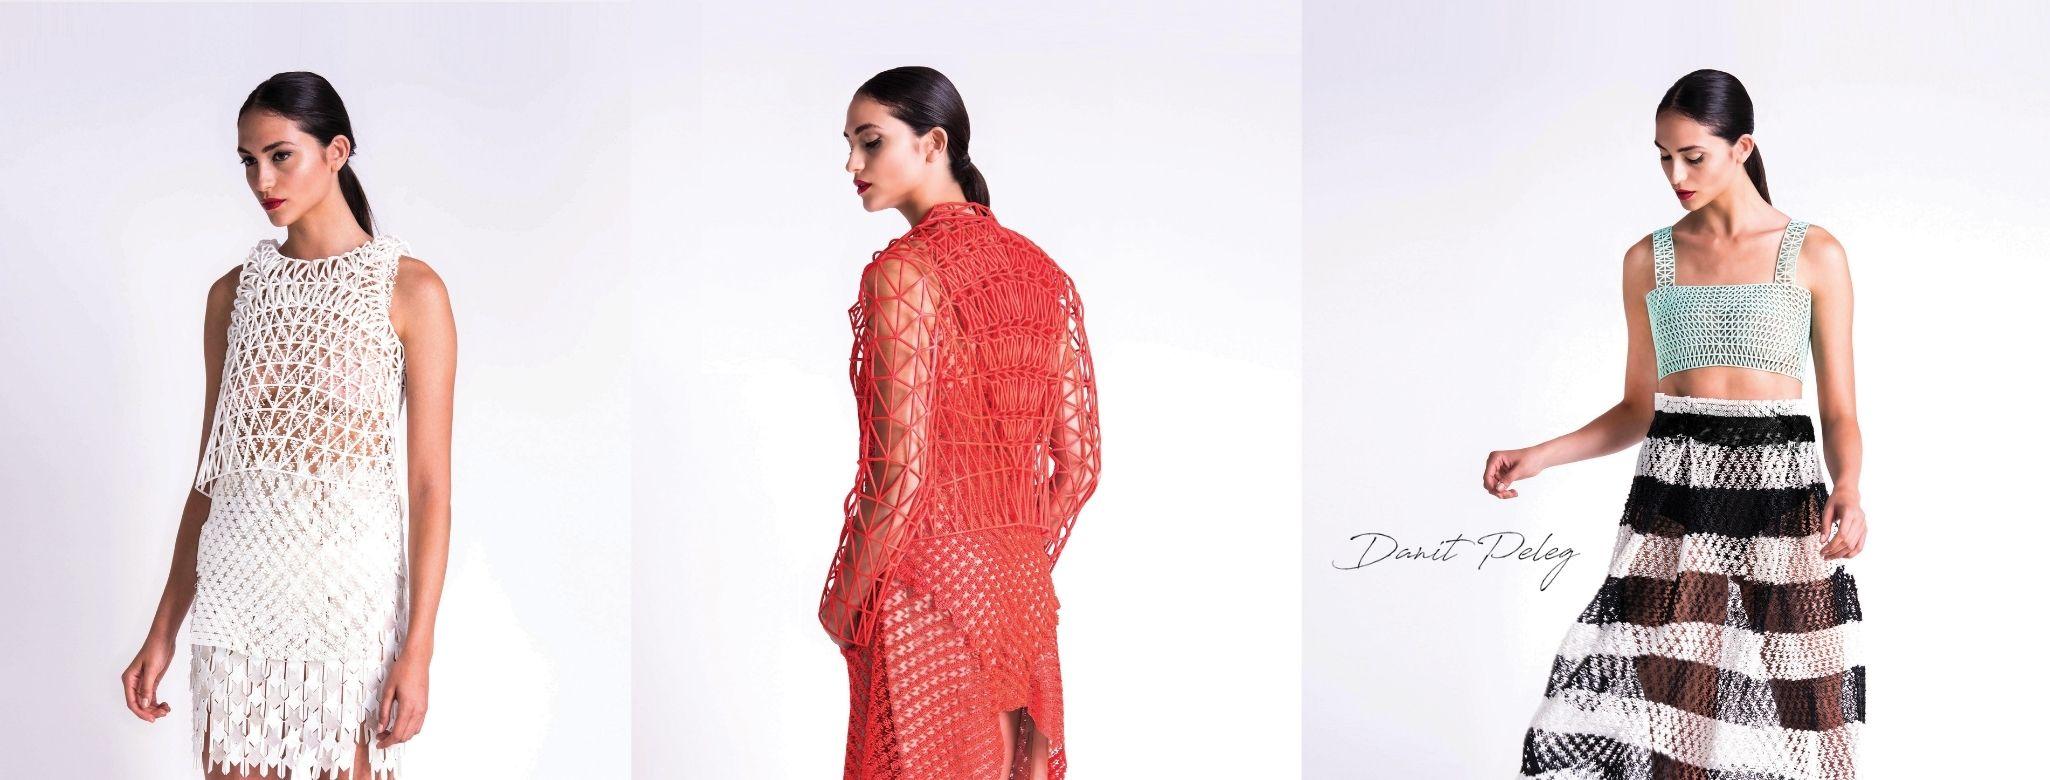 3D-printed fashion pieces by Danit Peleg